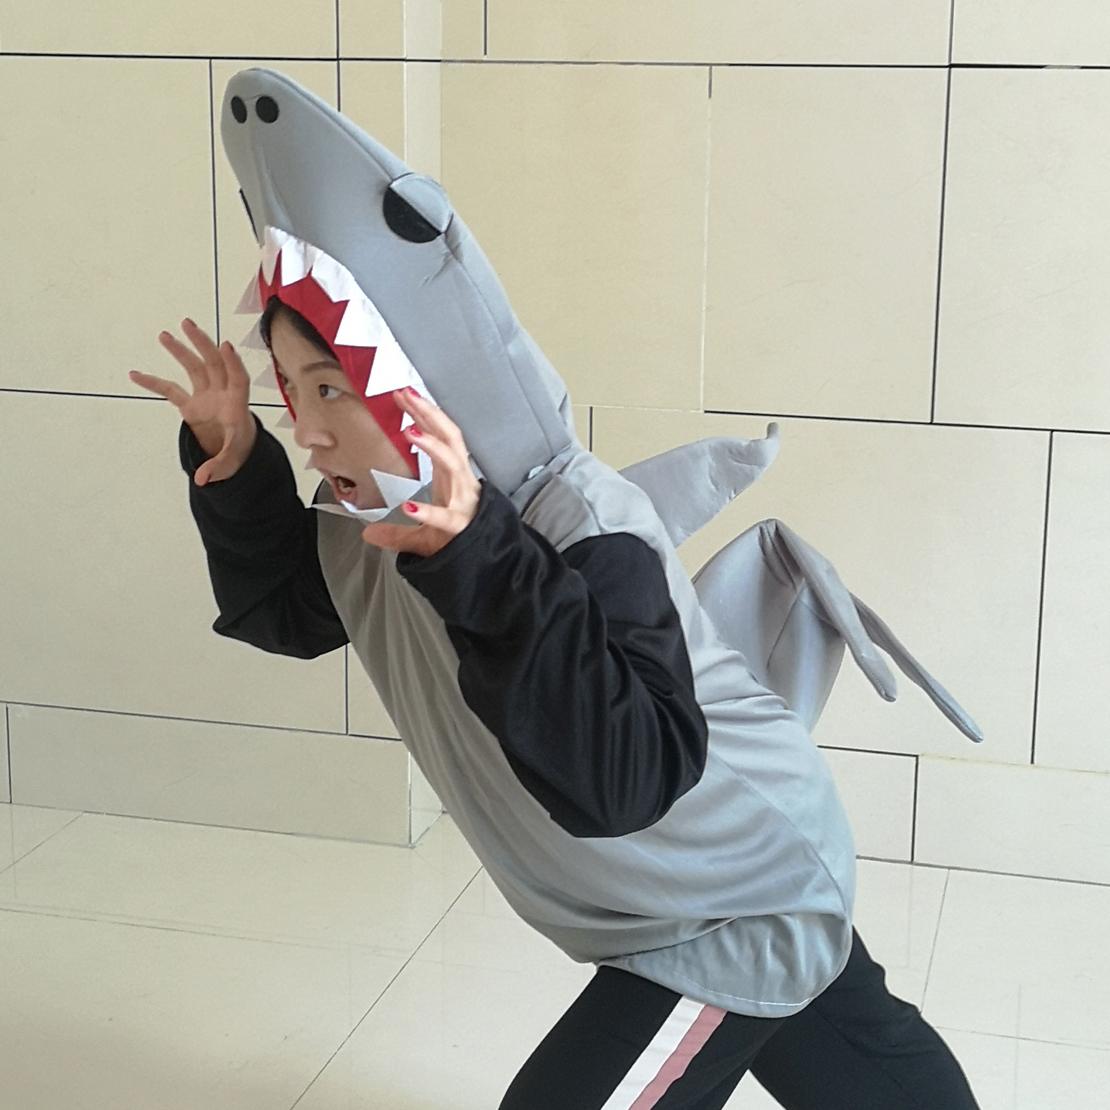 Hai Kostüm Fisch See Tier Kreatur Kostüm Outfür Karnevalskostüm Shark Neu